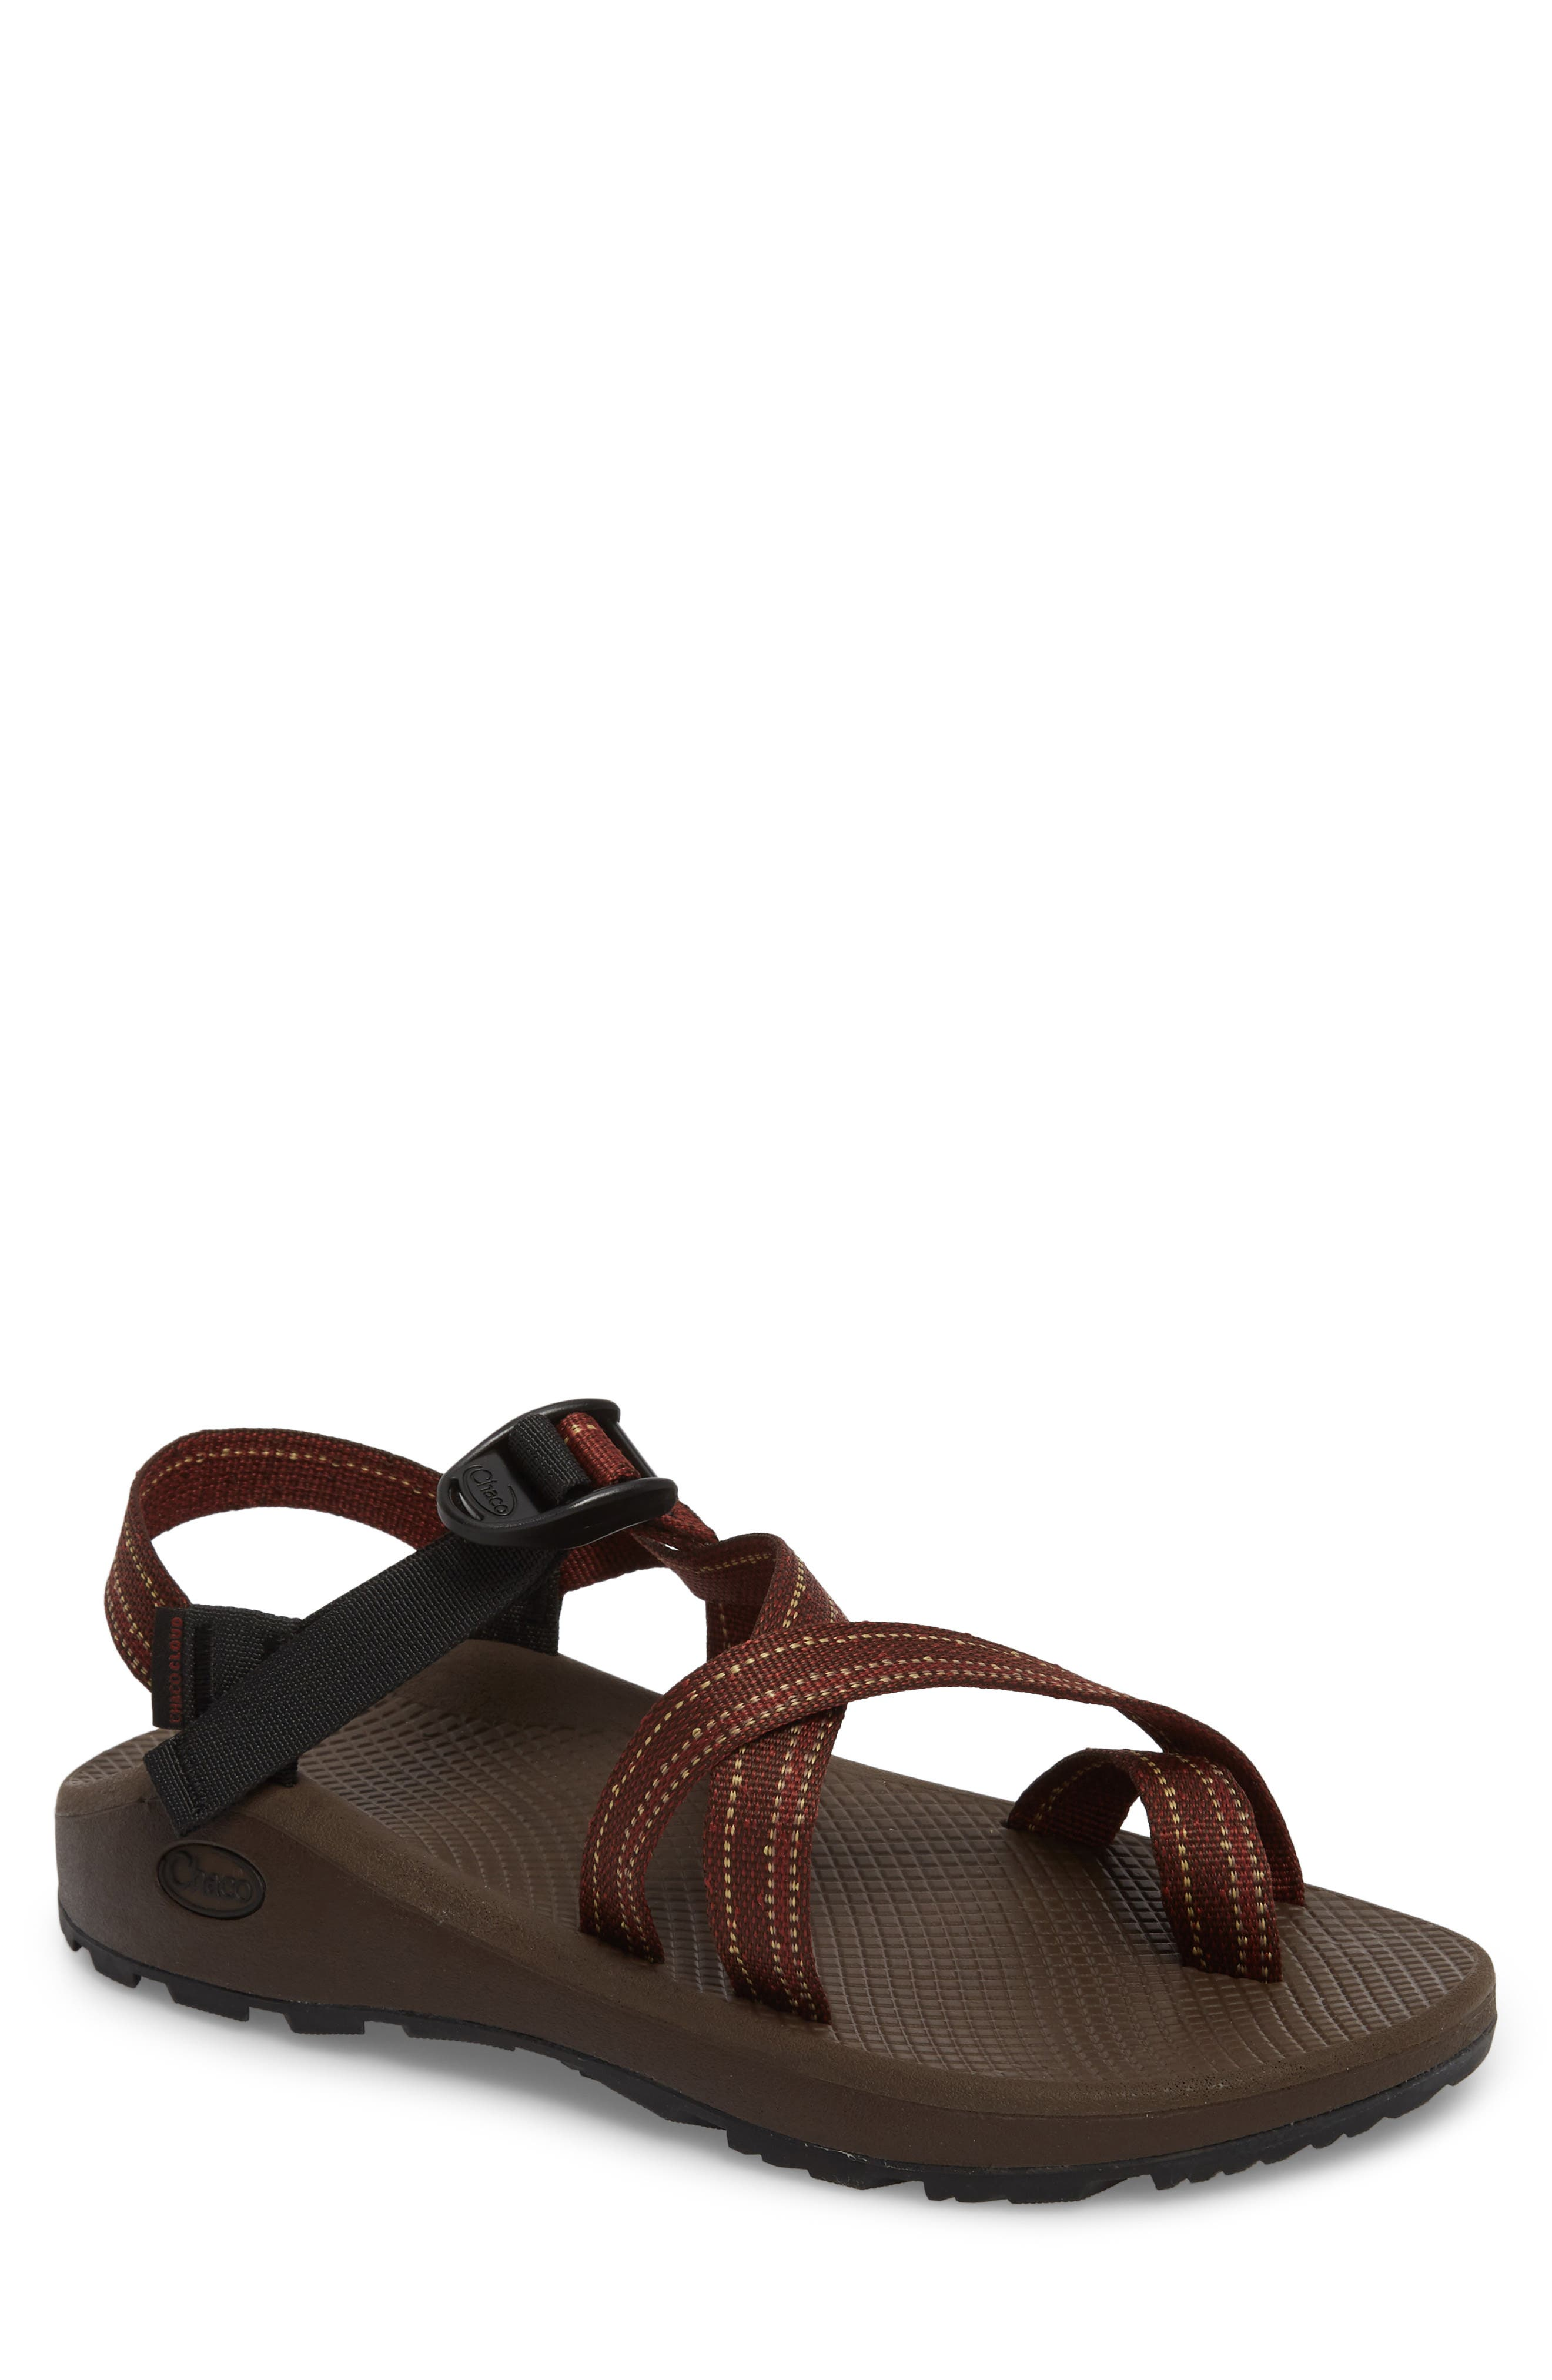 Z/Cloud 2 Sport Sandal,                         Main,                         color, Seam Rust